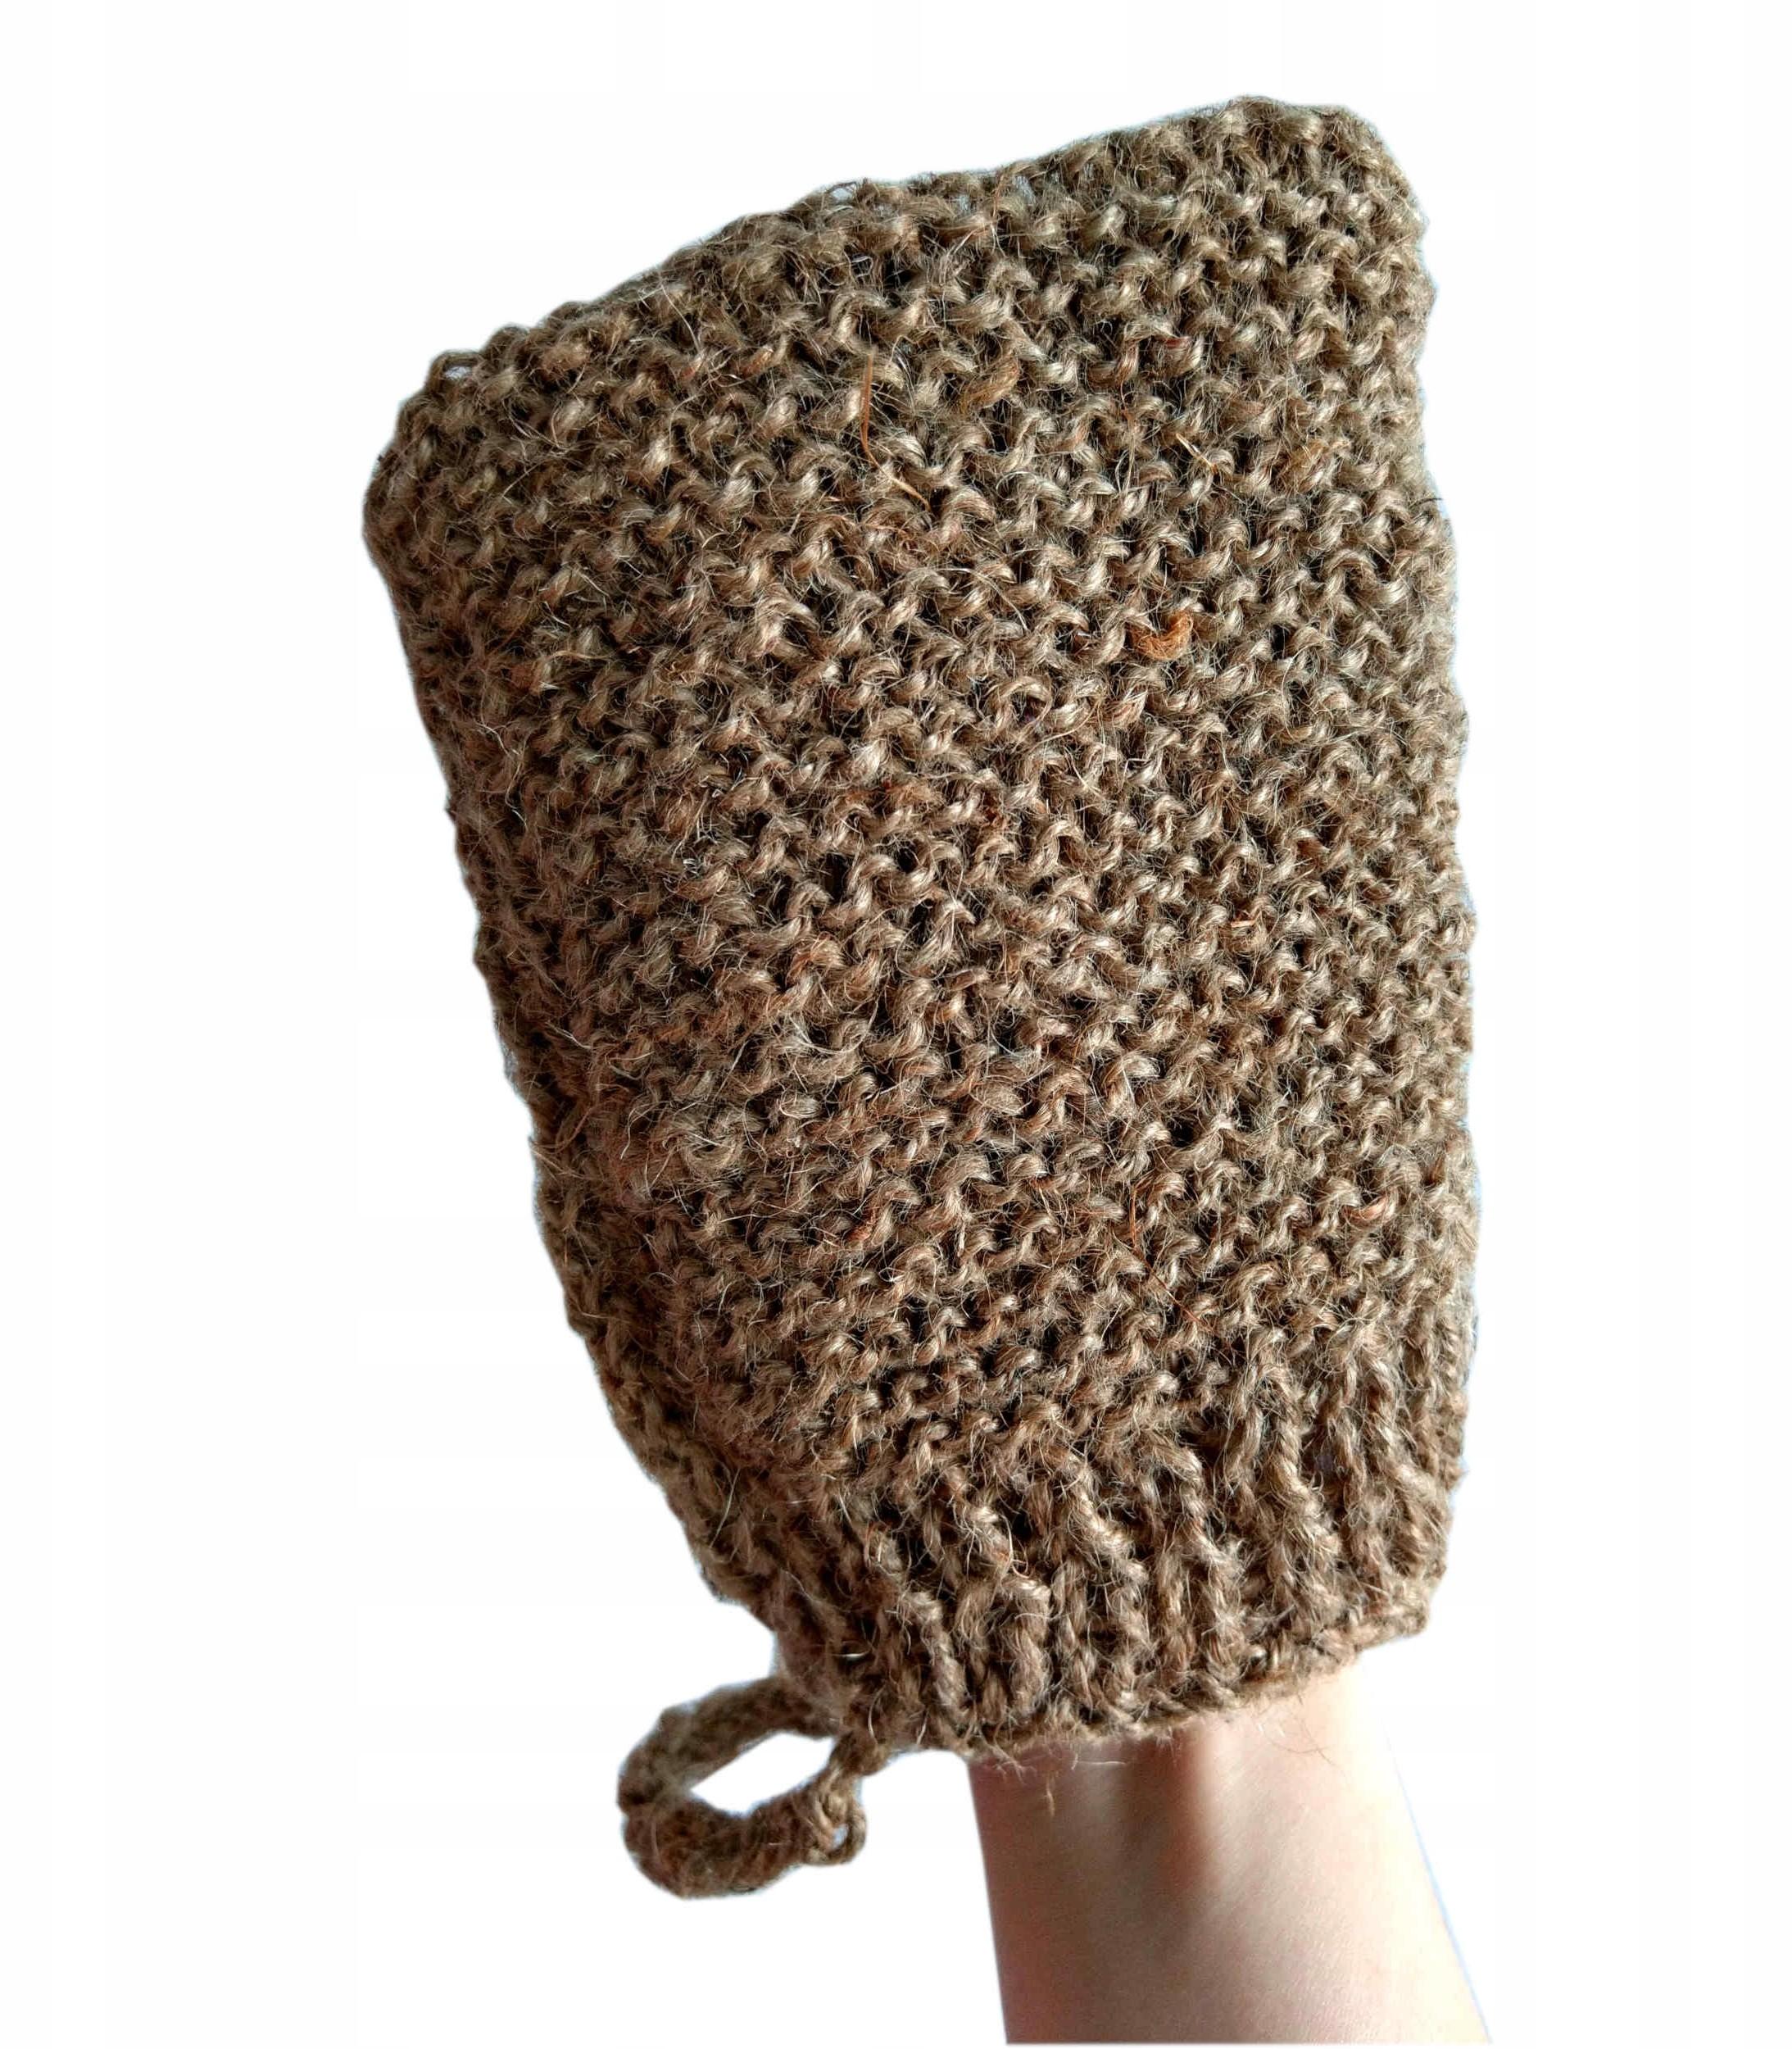 Naturalna rękawica do peelingu ze sznurka konopneg